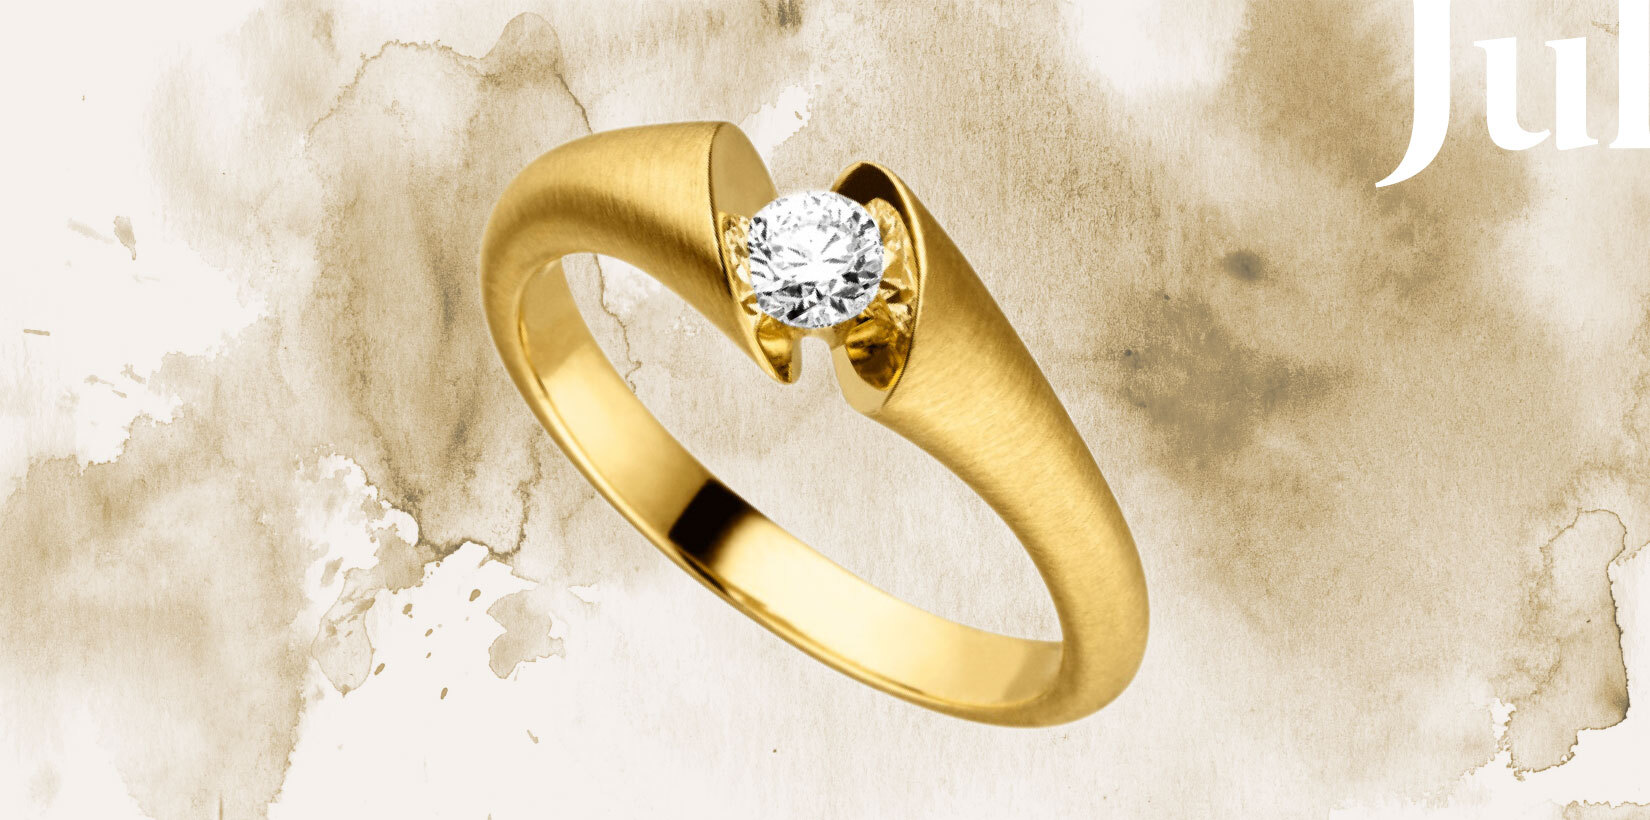 Thema des Monats Goldrausch bei Juwelier Fridrich München